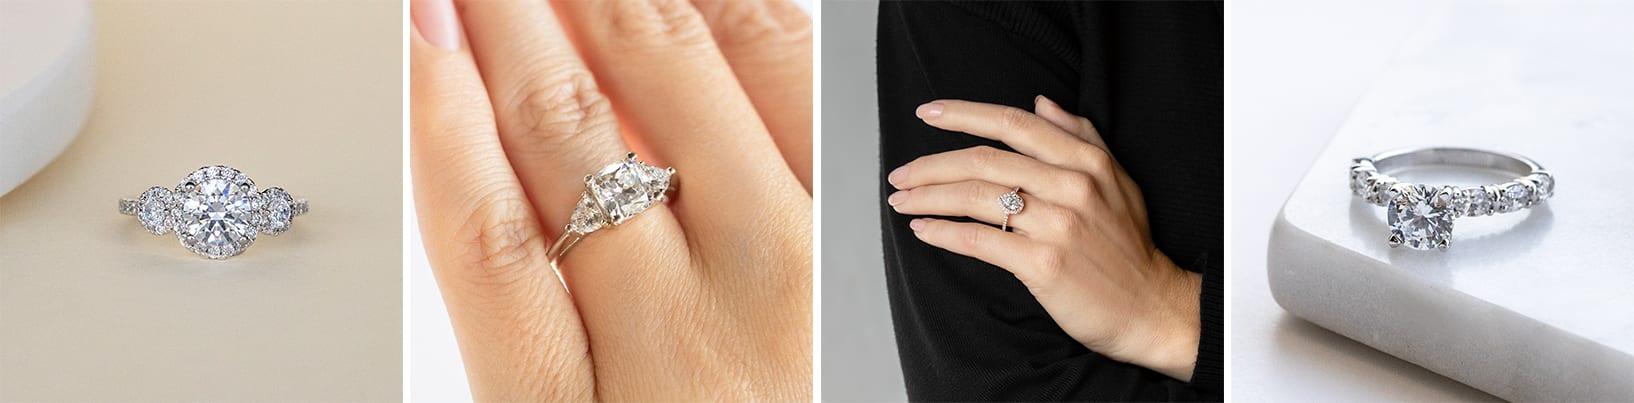 Unique simulated diamond engagement rings.